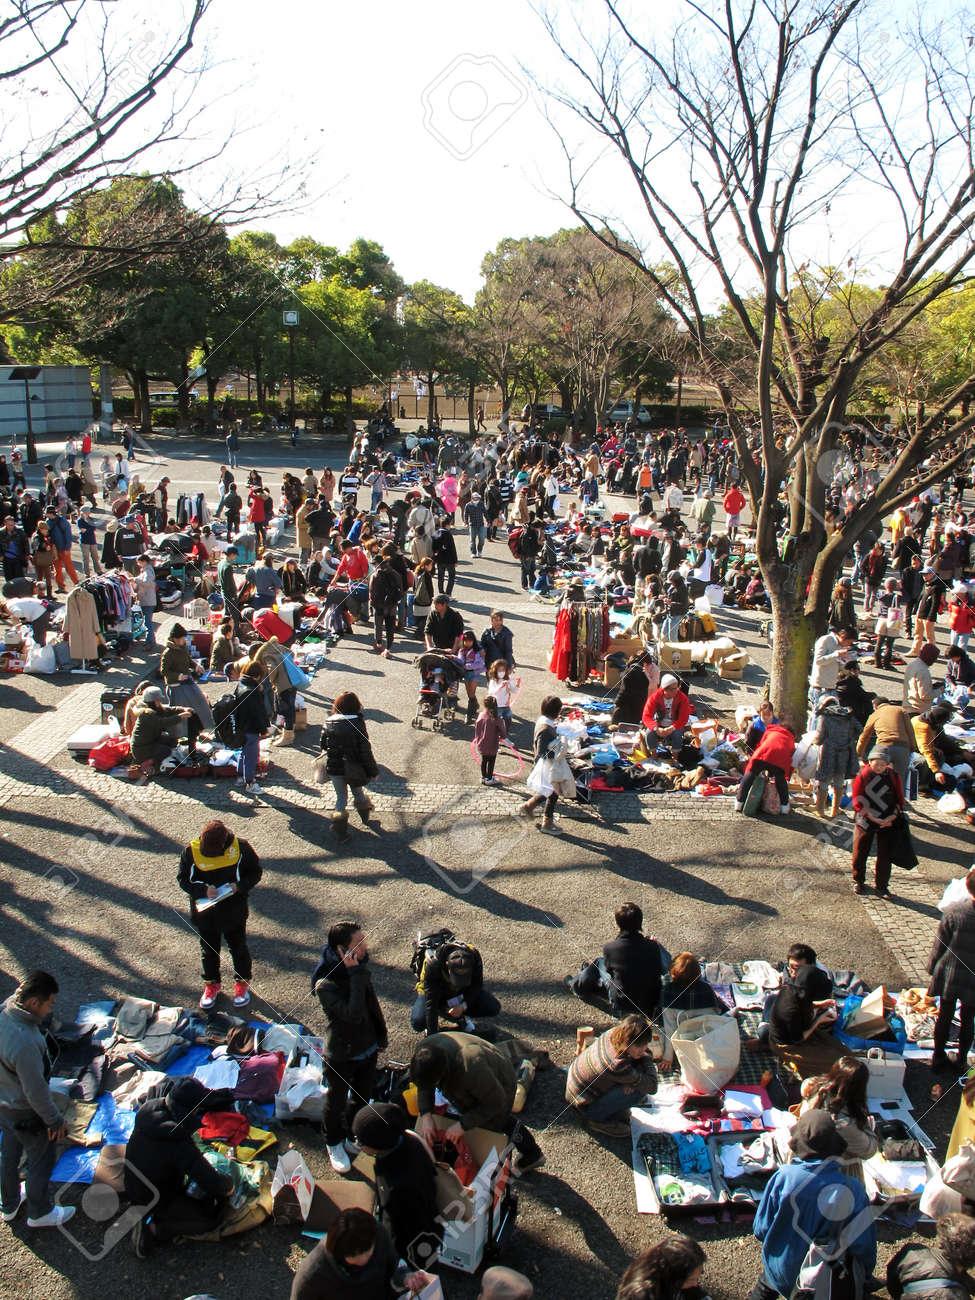 HARAJUKU,TOKYO - DECEMBER 16, 2012 - Shoppers come to flea market at Yoyogi Park in Harajuku. It is the monthly flea market in the city of fashion Harajuku. Stock Photo - 17261904